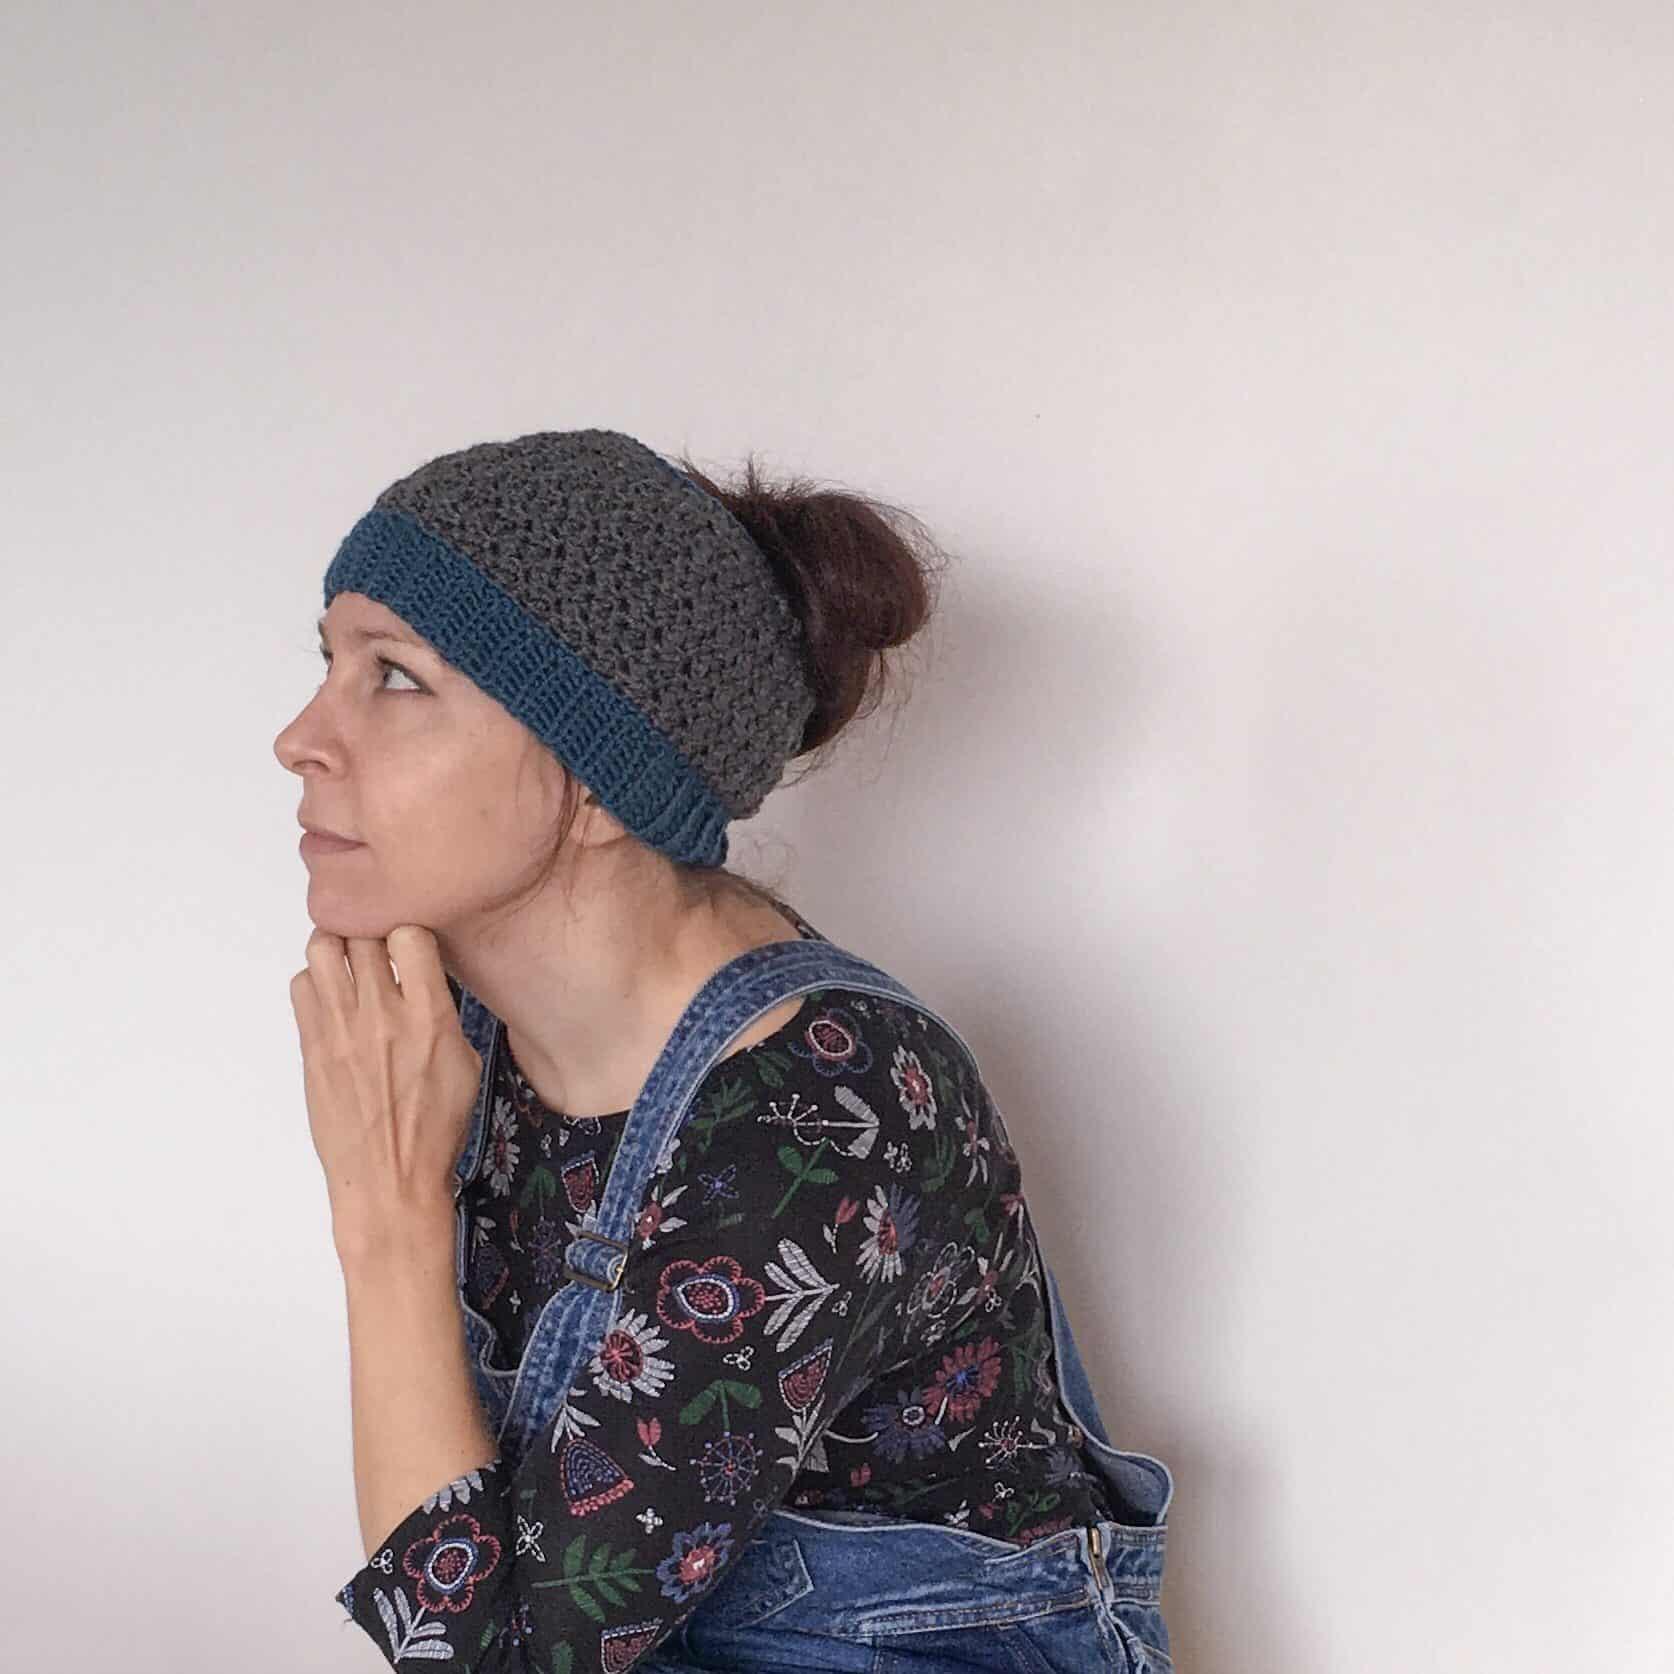 crochet Studio Bun Hat from doradoes.co.uk